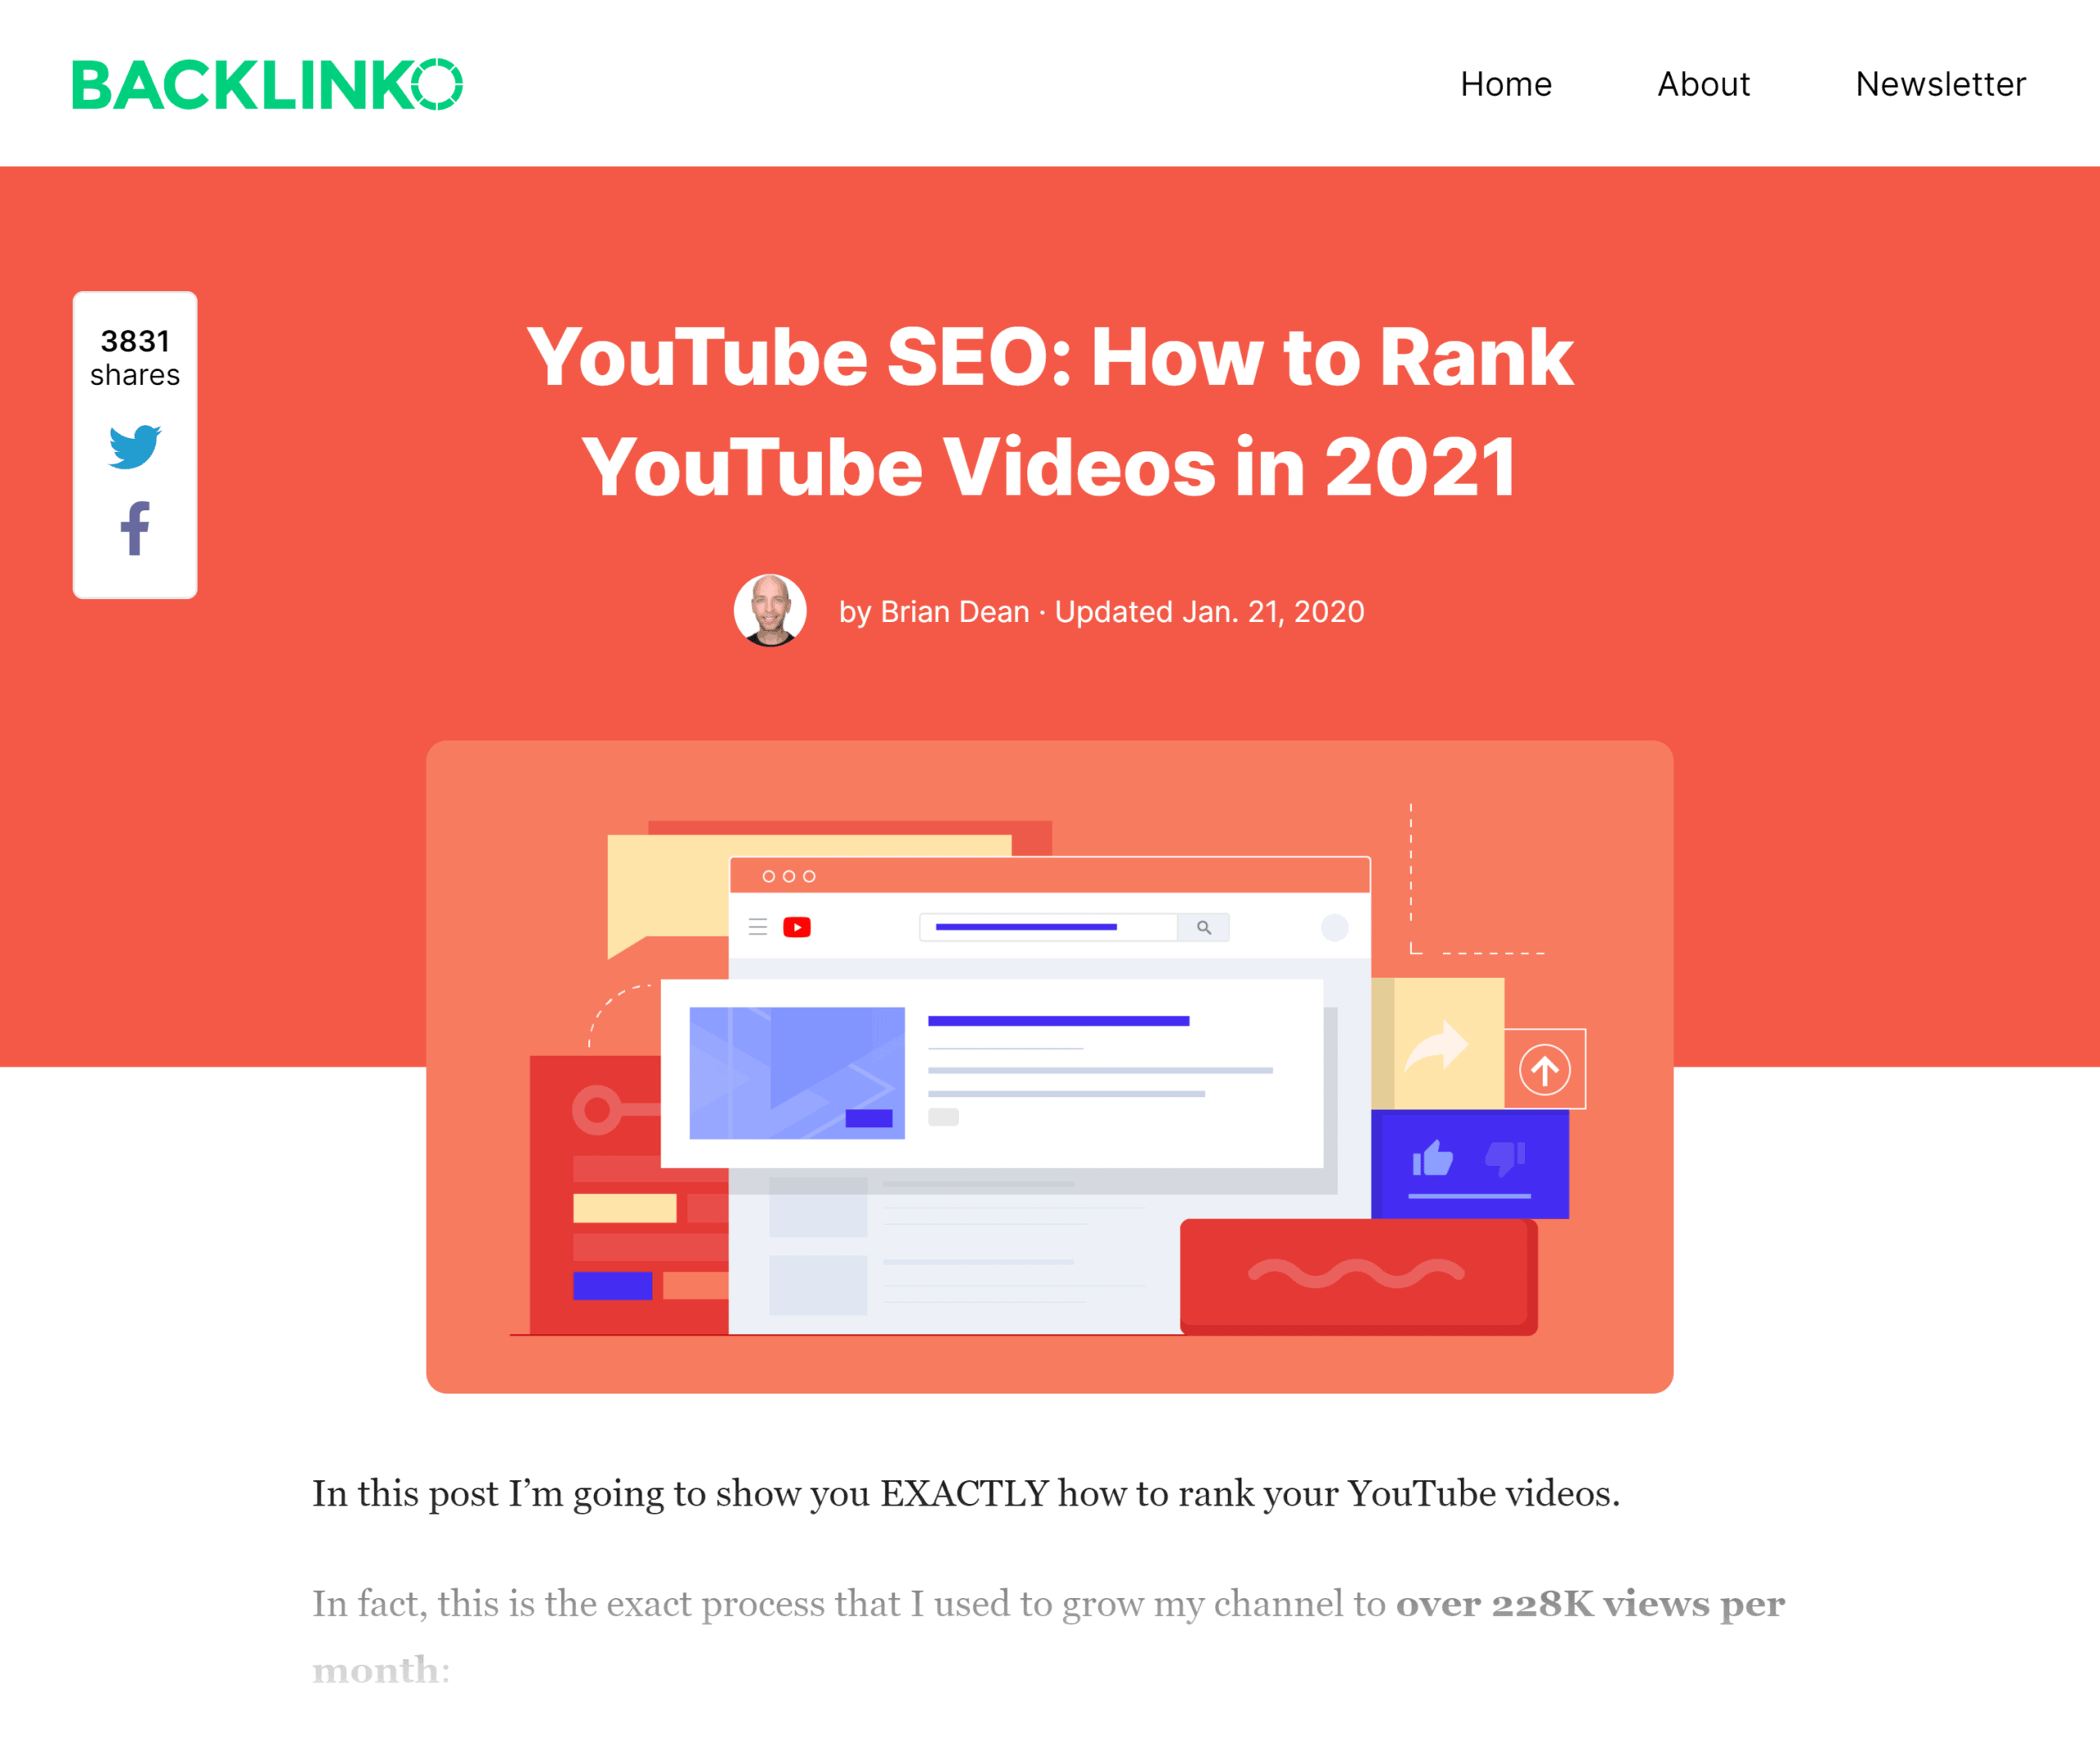 Backlinko – How to rank YouTube videos